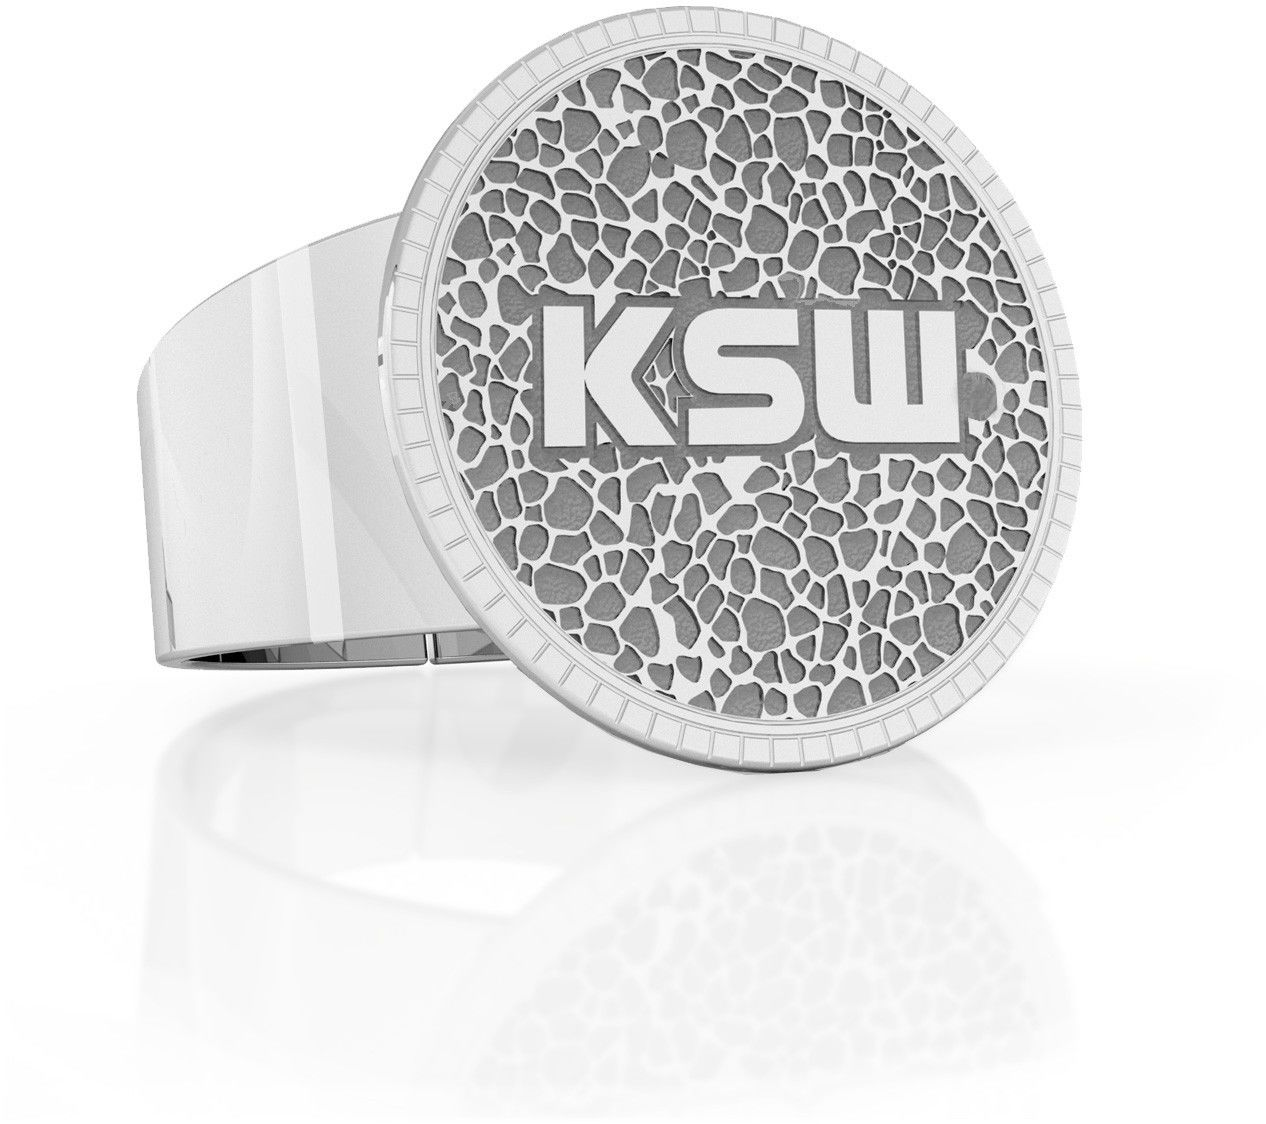 Sygnet ze wzorem, logo KSW, srebro 925 : Srebro - kolor pokrycia - Platyną